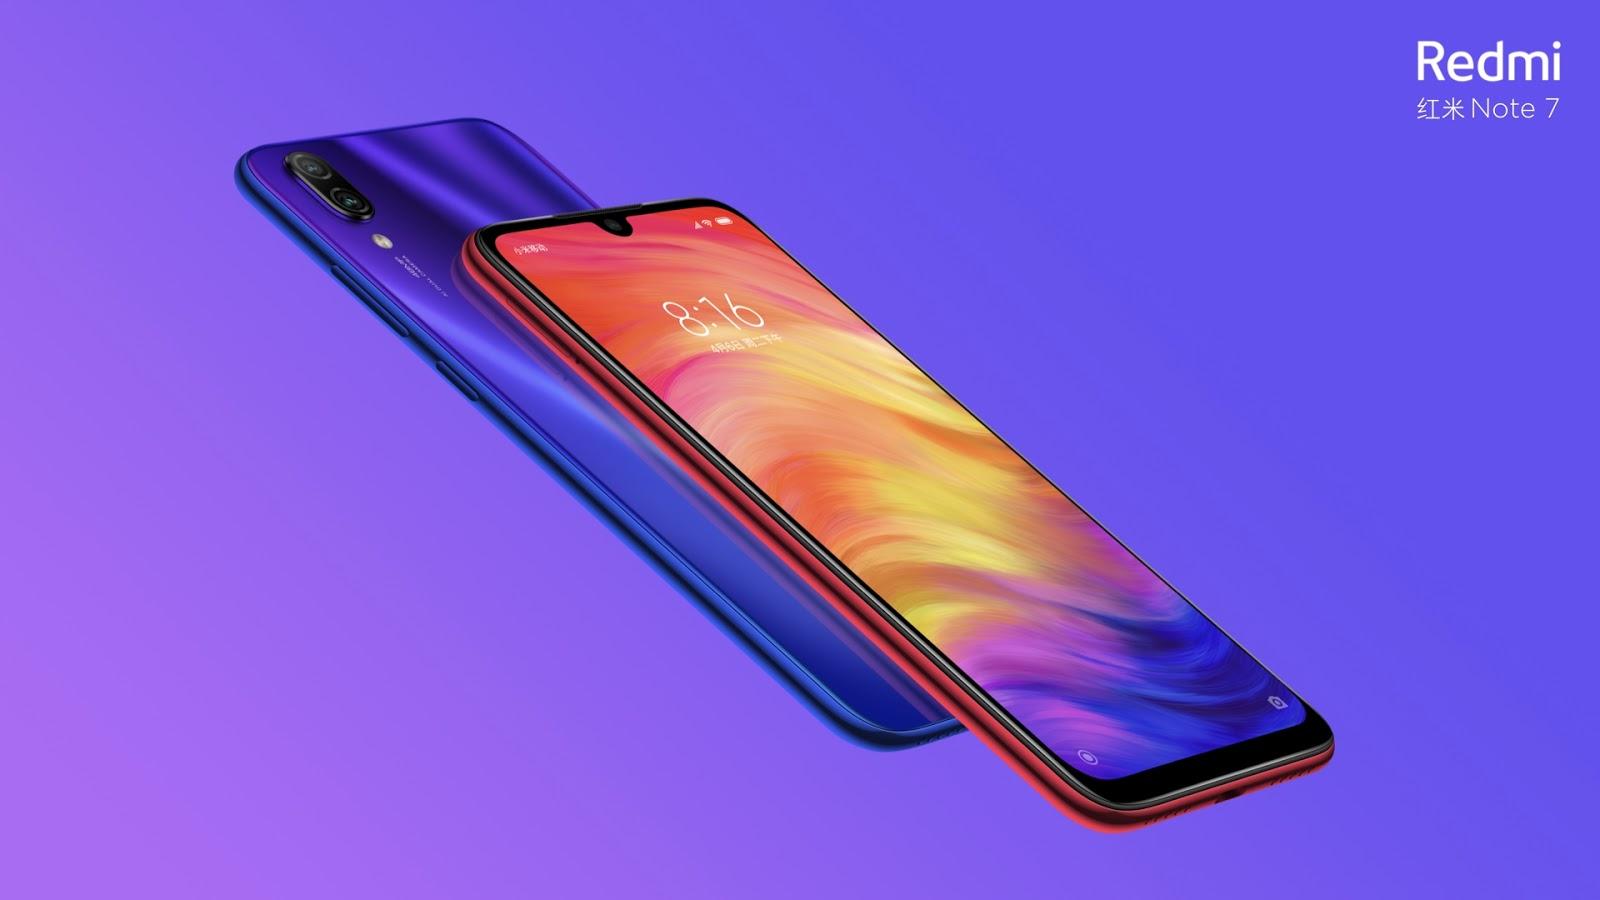 Xiaomi Redmi Note 7 launched in China, Pocophone F1 software